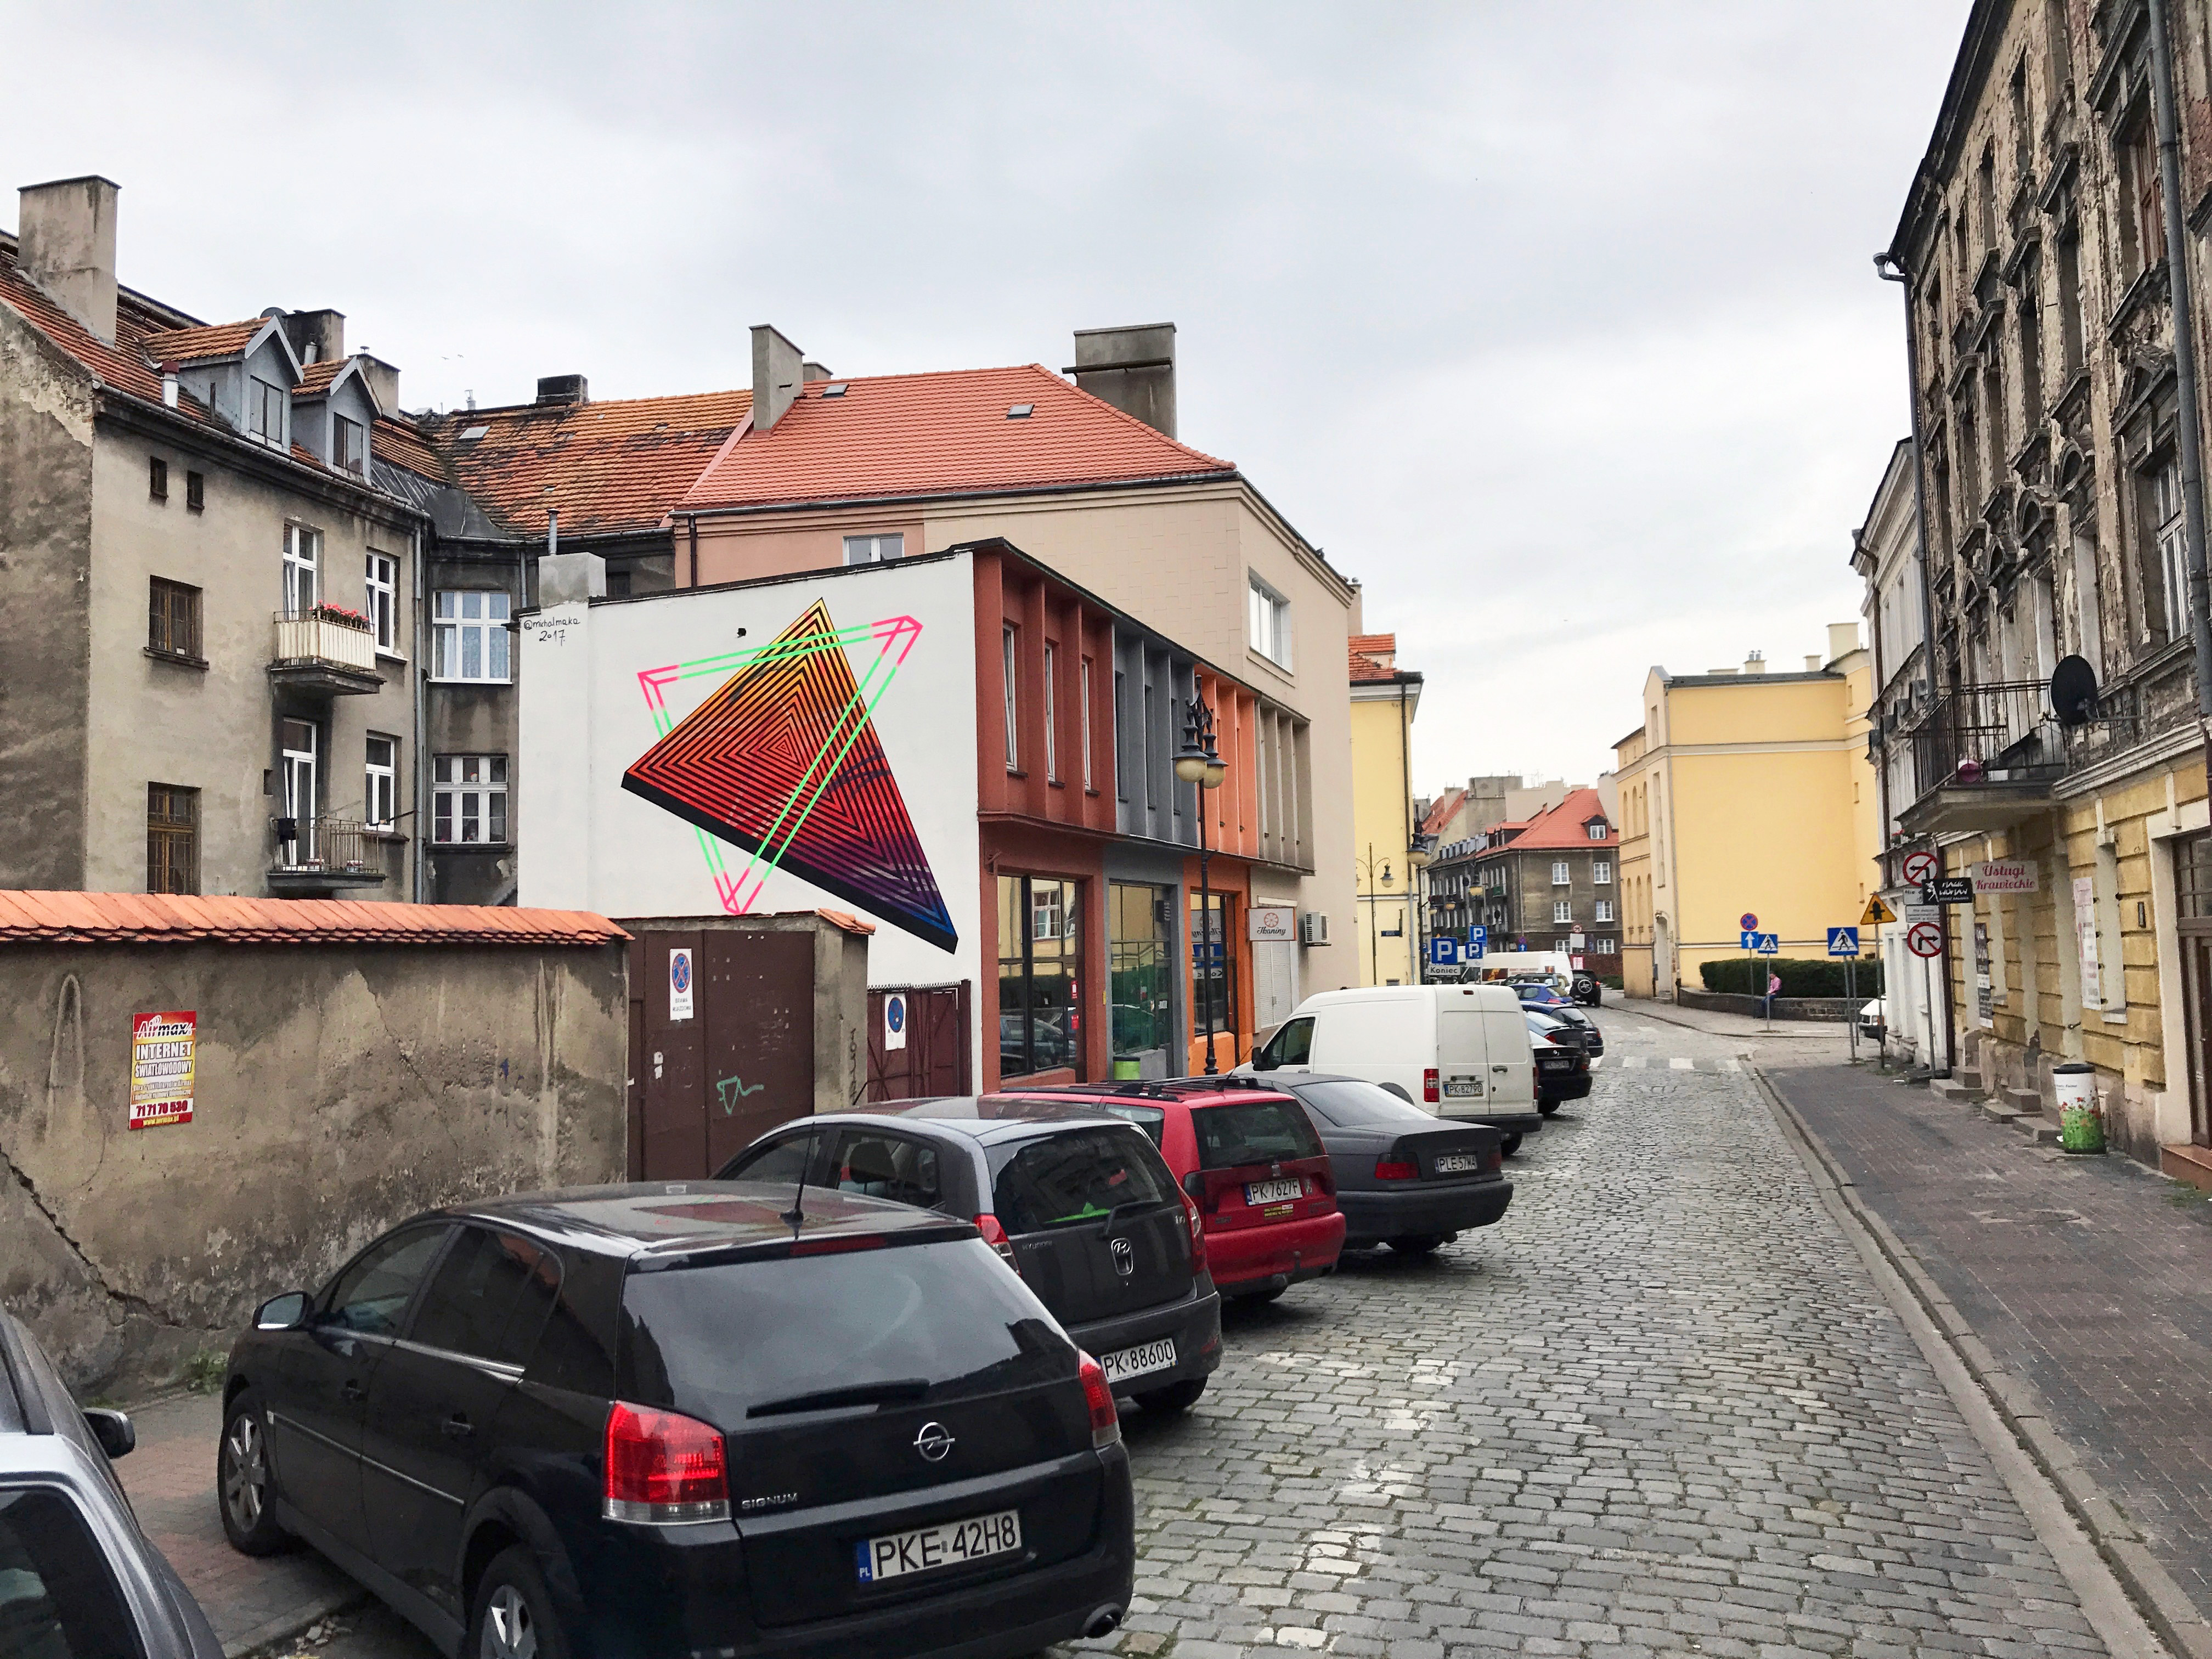 Kalisz, Poland